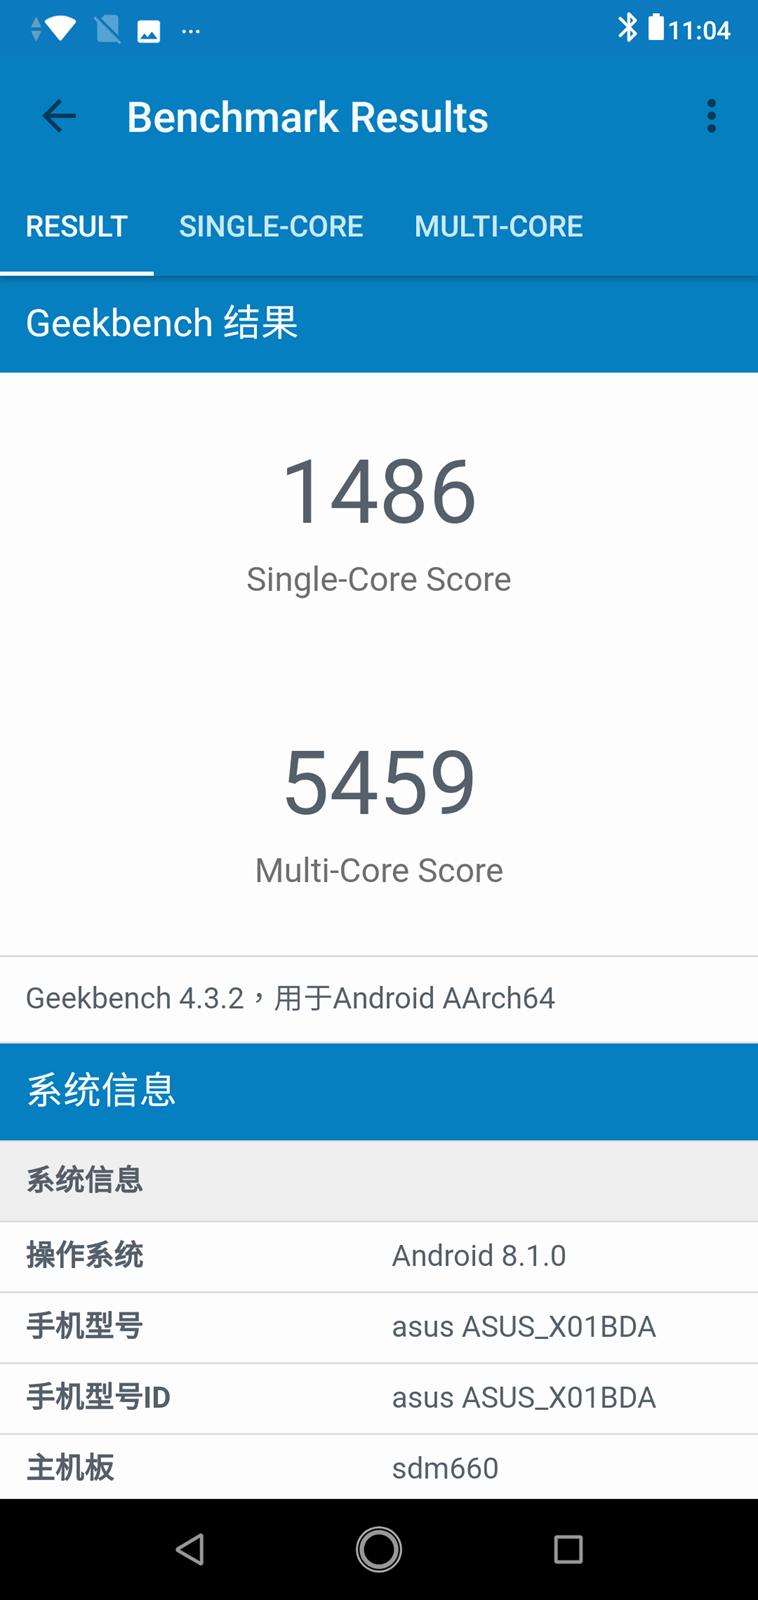 MAX 電力強機新機登場!ZenFone Max Pro (M2) 性能更好電力更強 @3C 達人廖阿輝